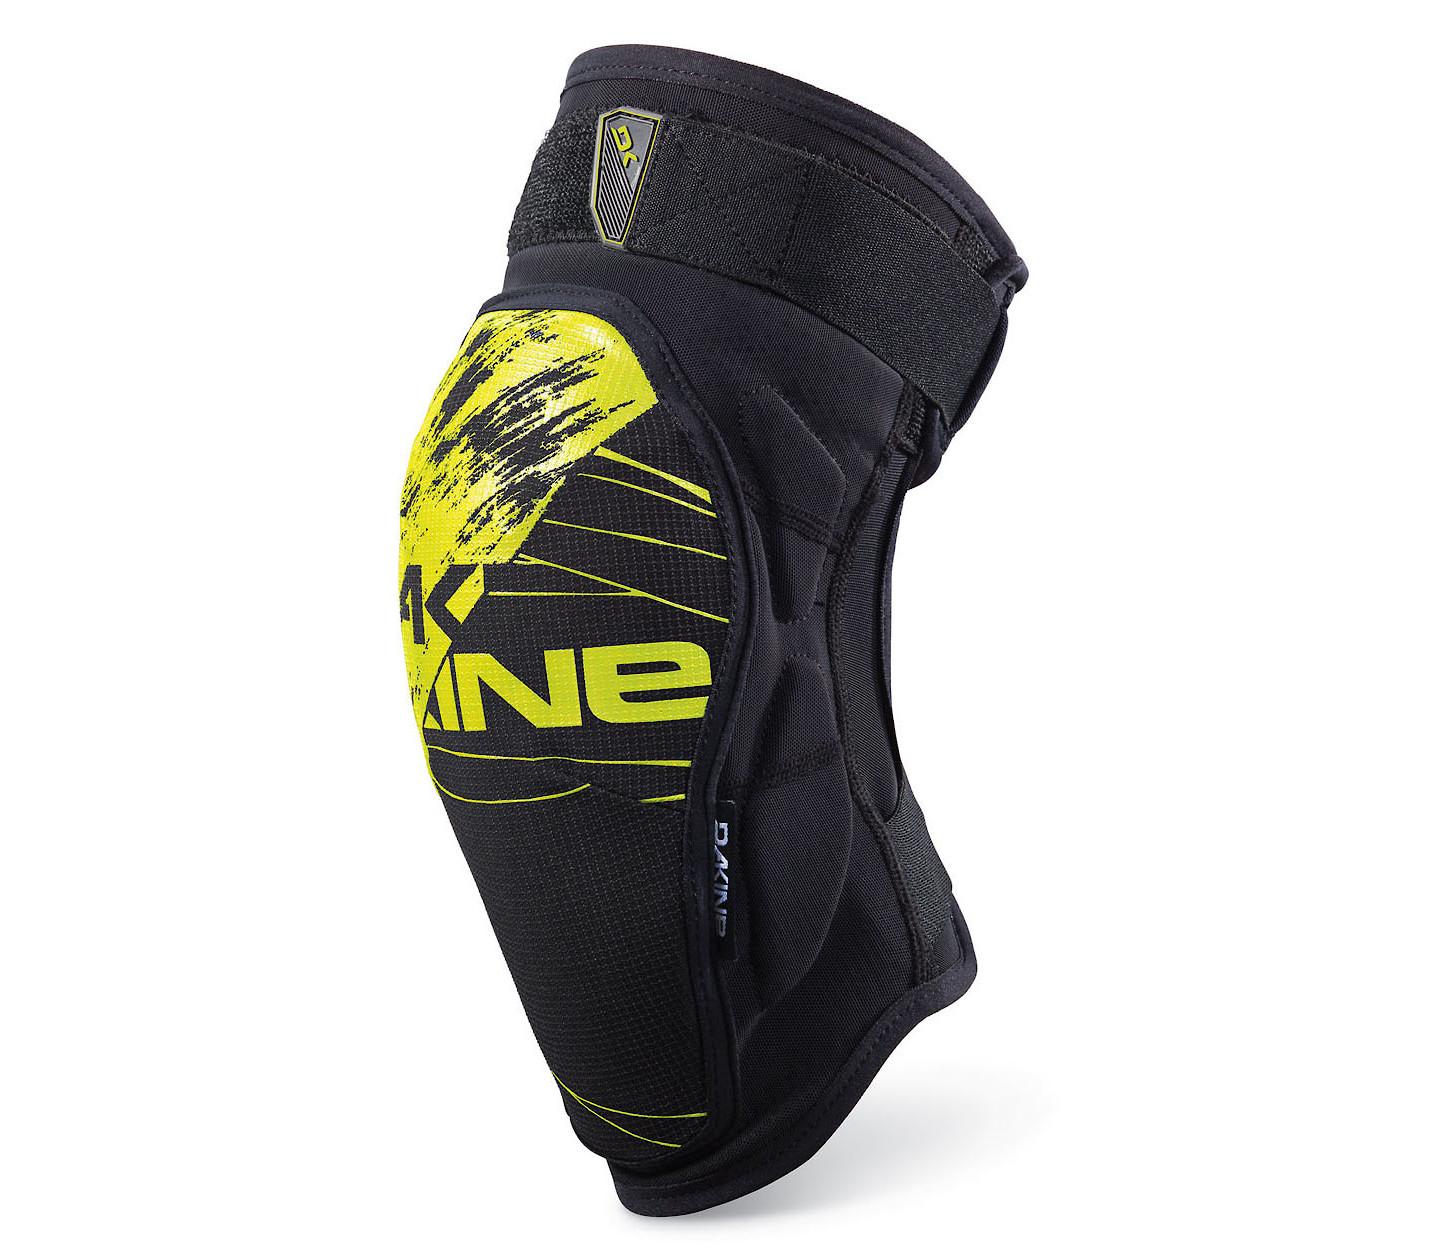 2017 Dakine Anthem Knee Pad (sulphur)